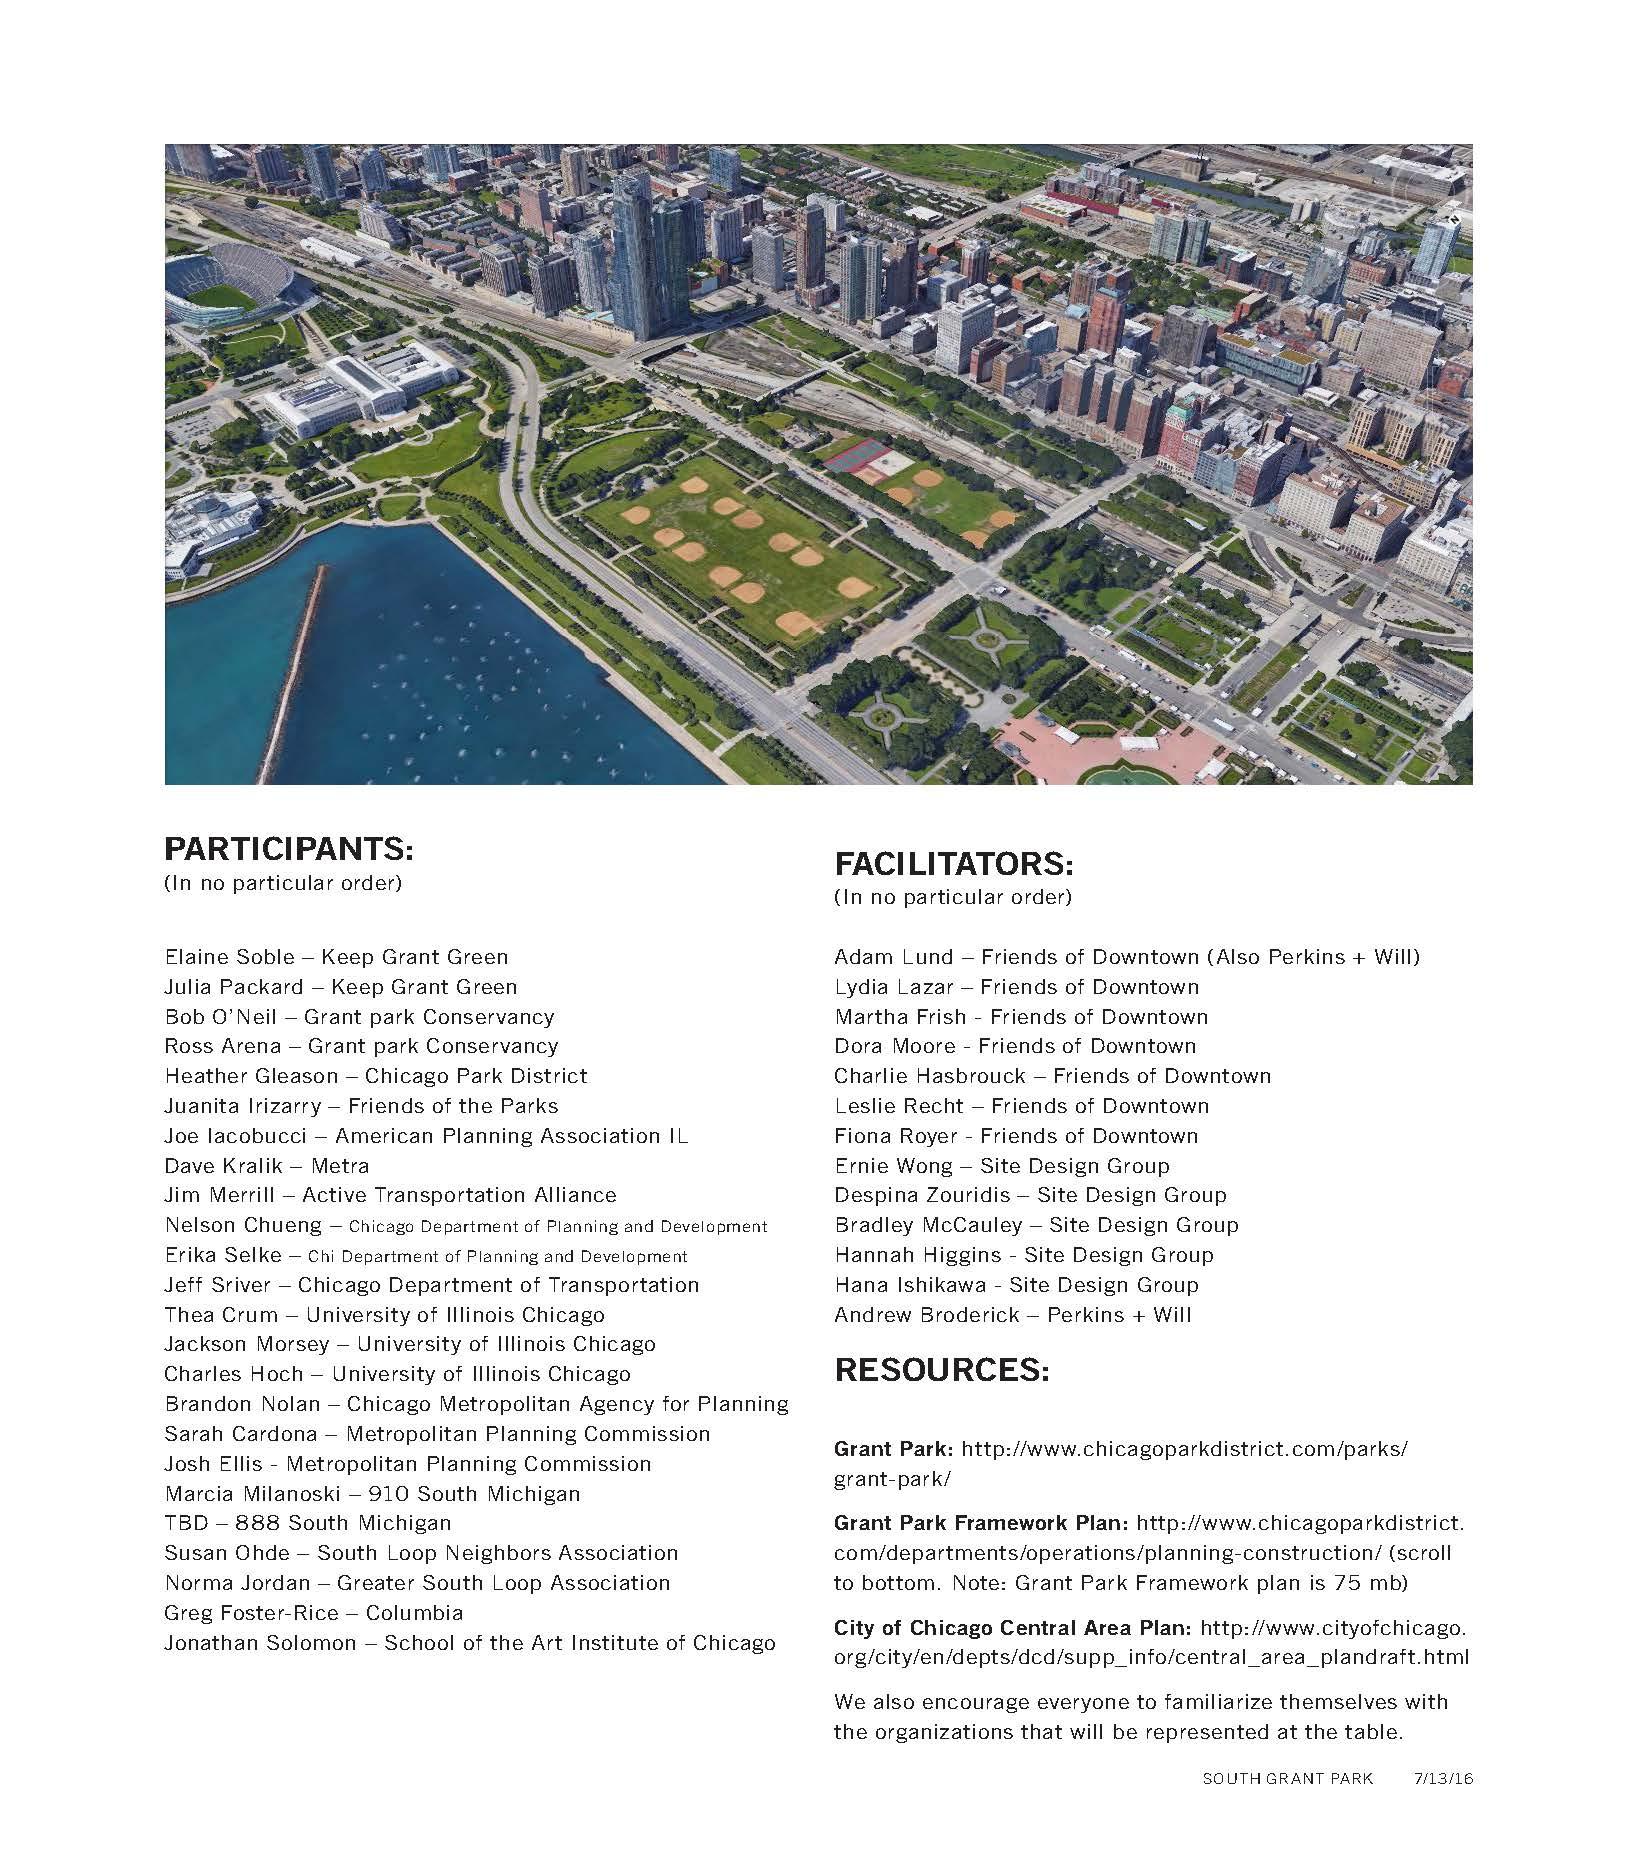 20160712 South Grant Park Handout_Page_2.jpg